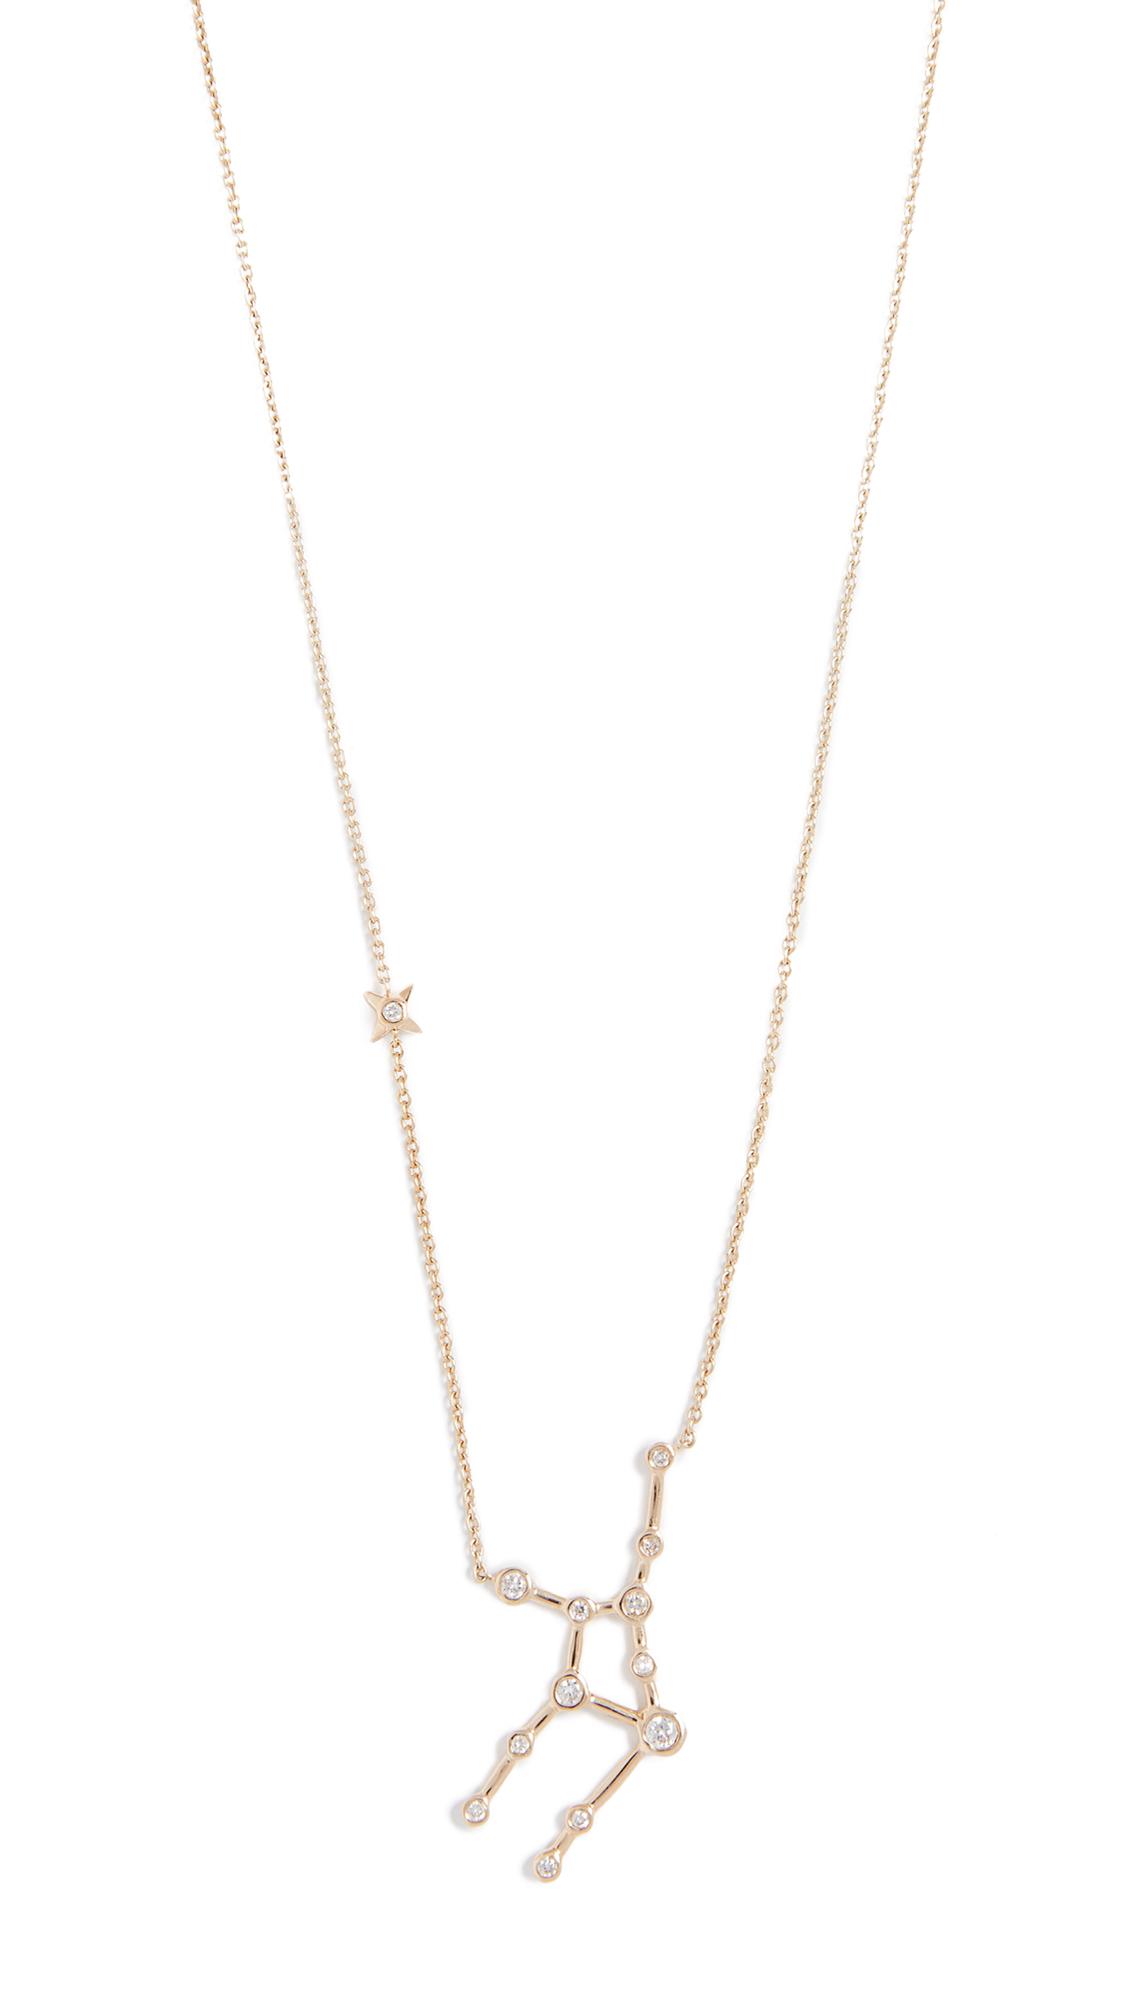 LULU FROST 14K Gold Virgo Necklace With White Diamonds